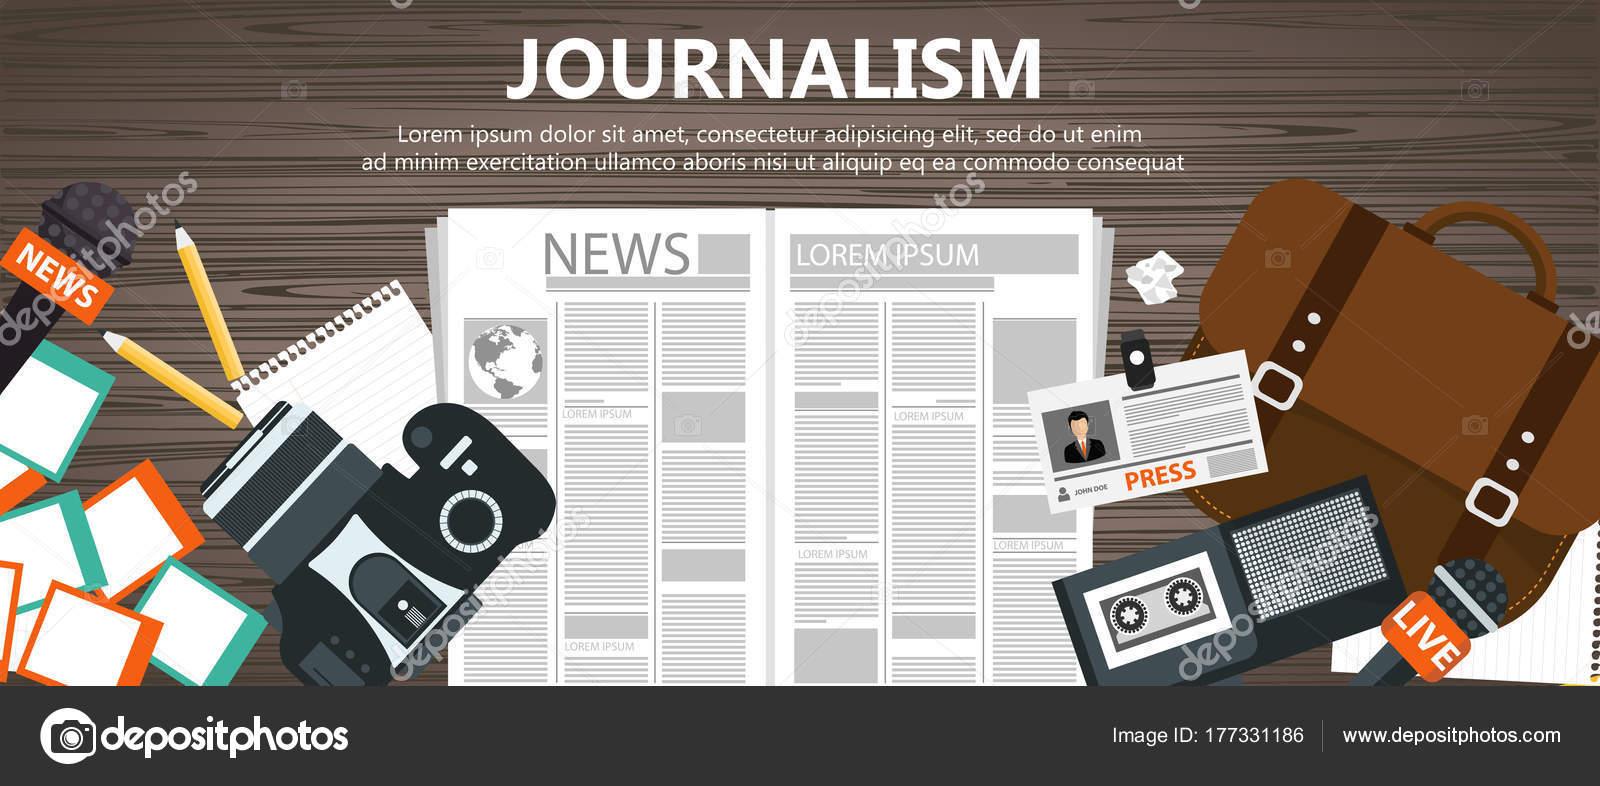 Journalism Flat Banner Equipment Journalist Desk Flat Vector Illustration —  Stock Vector